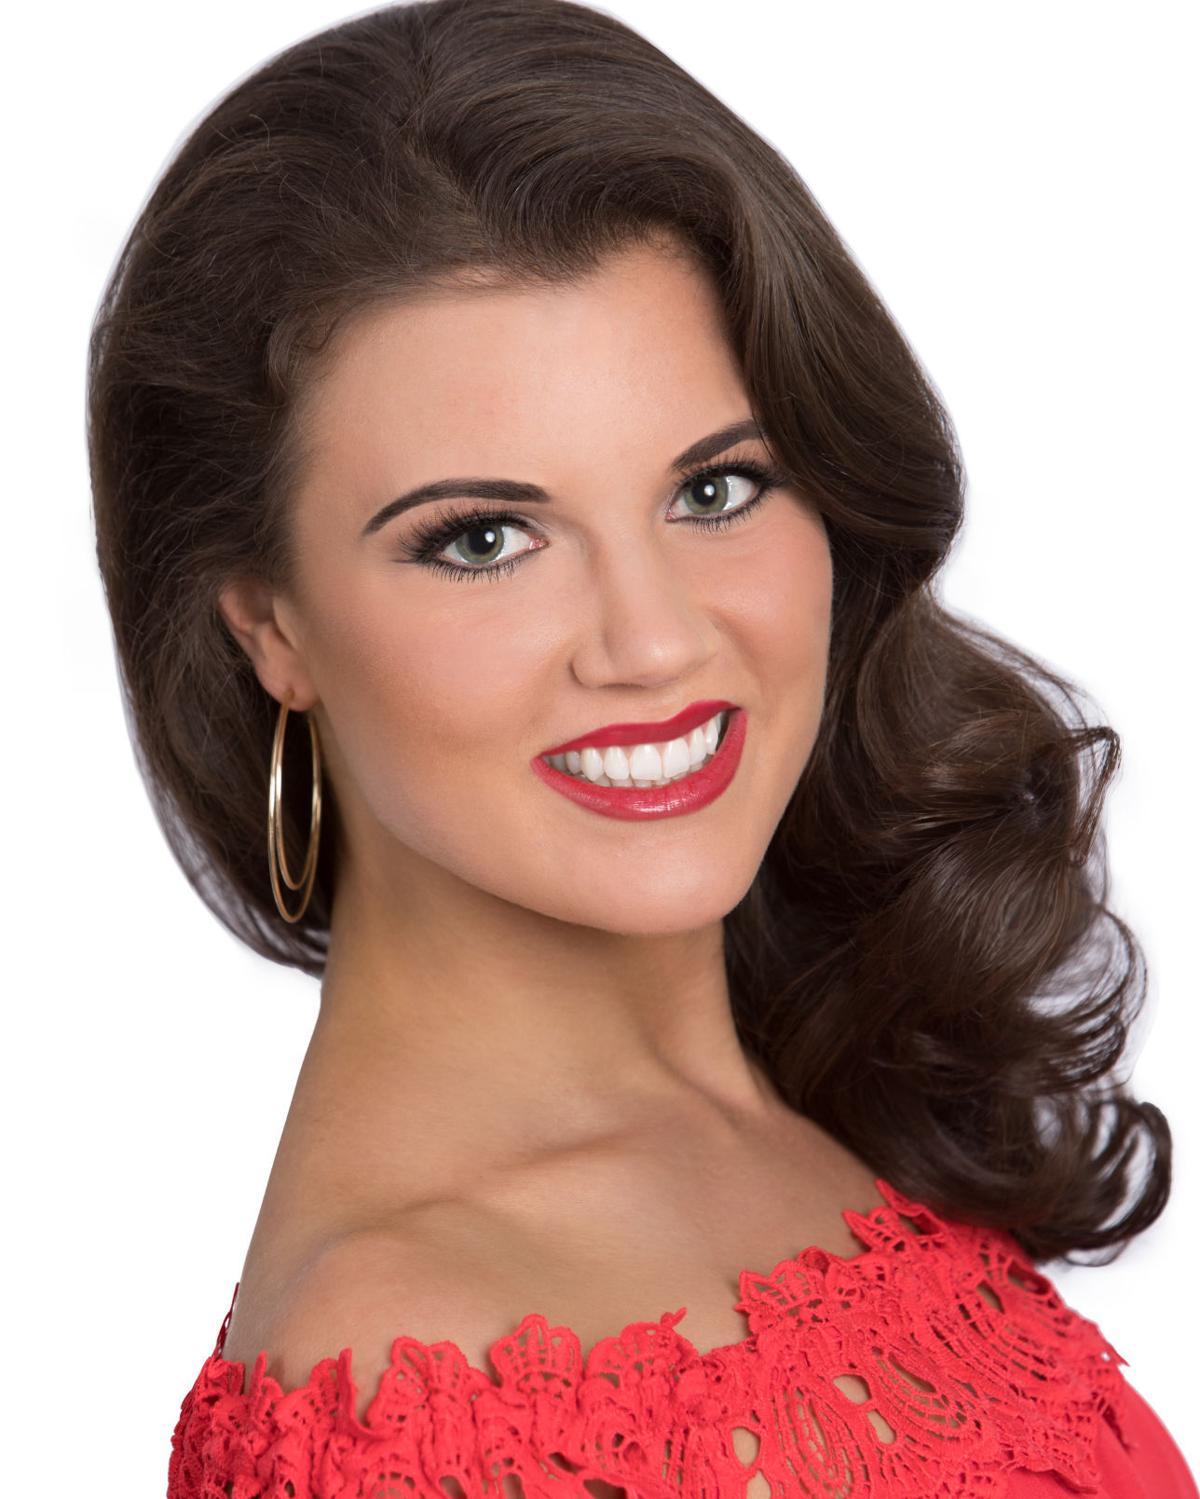 Miss New Hampshire 2017 Lauren Percy